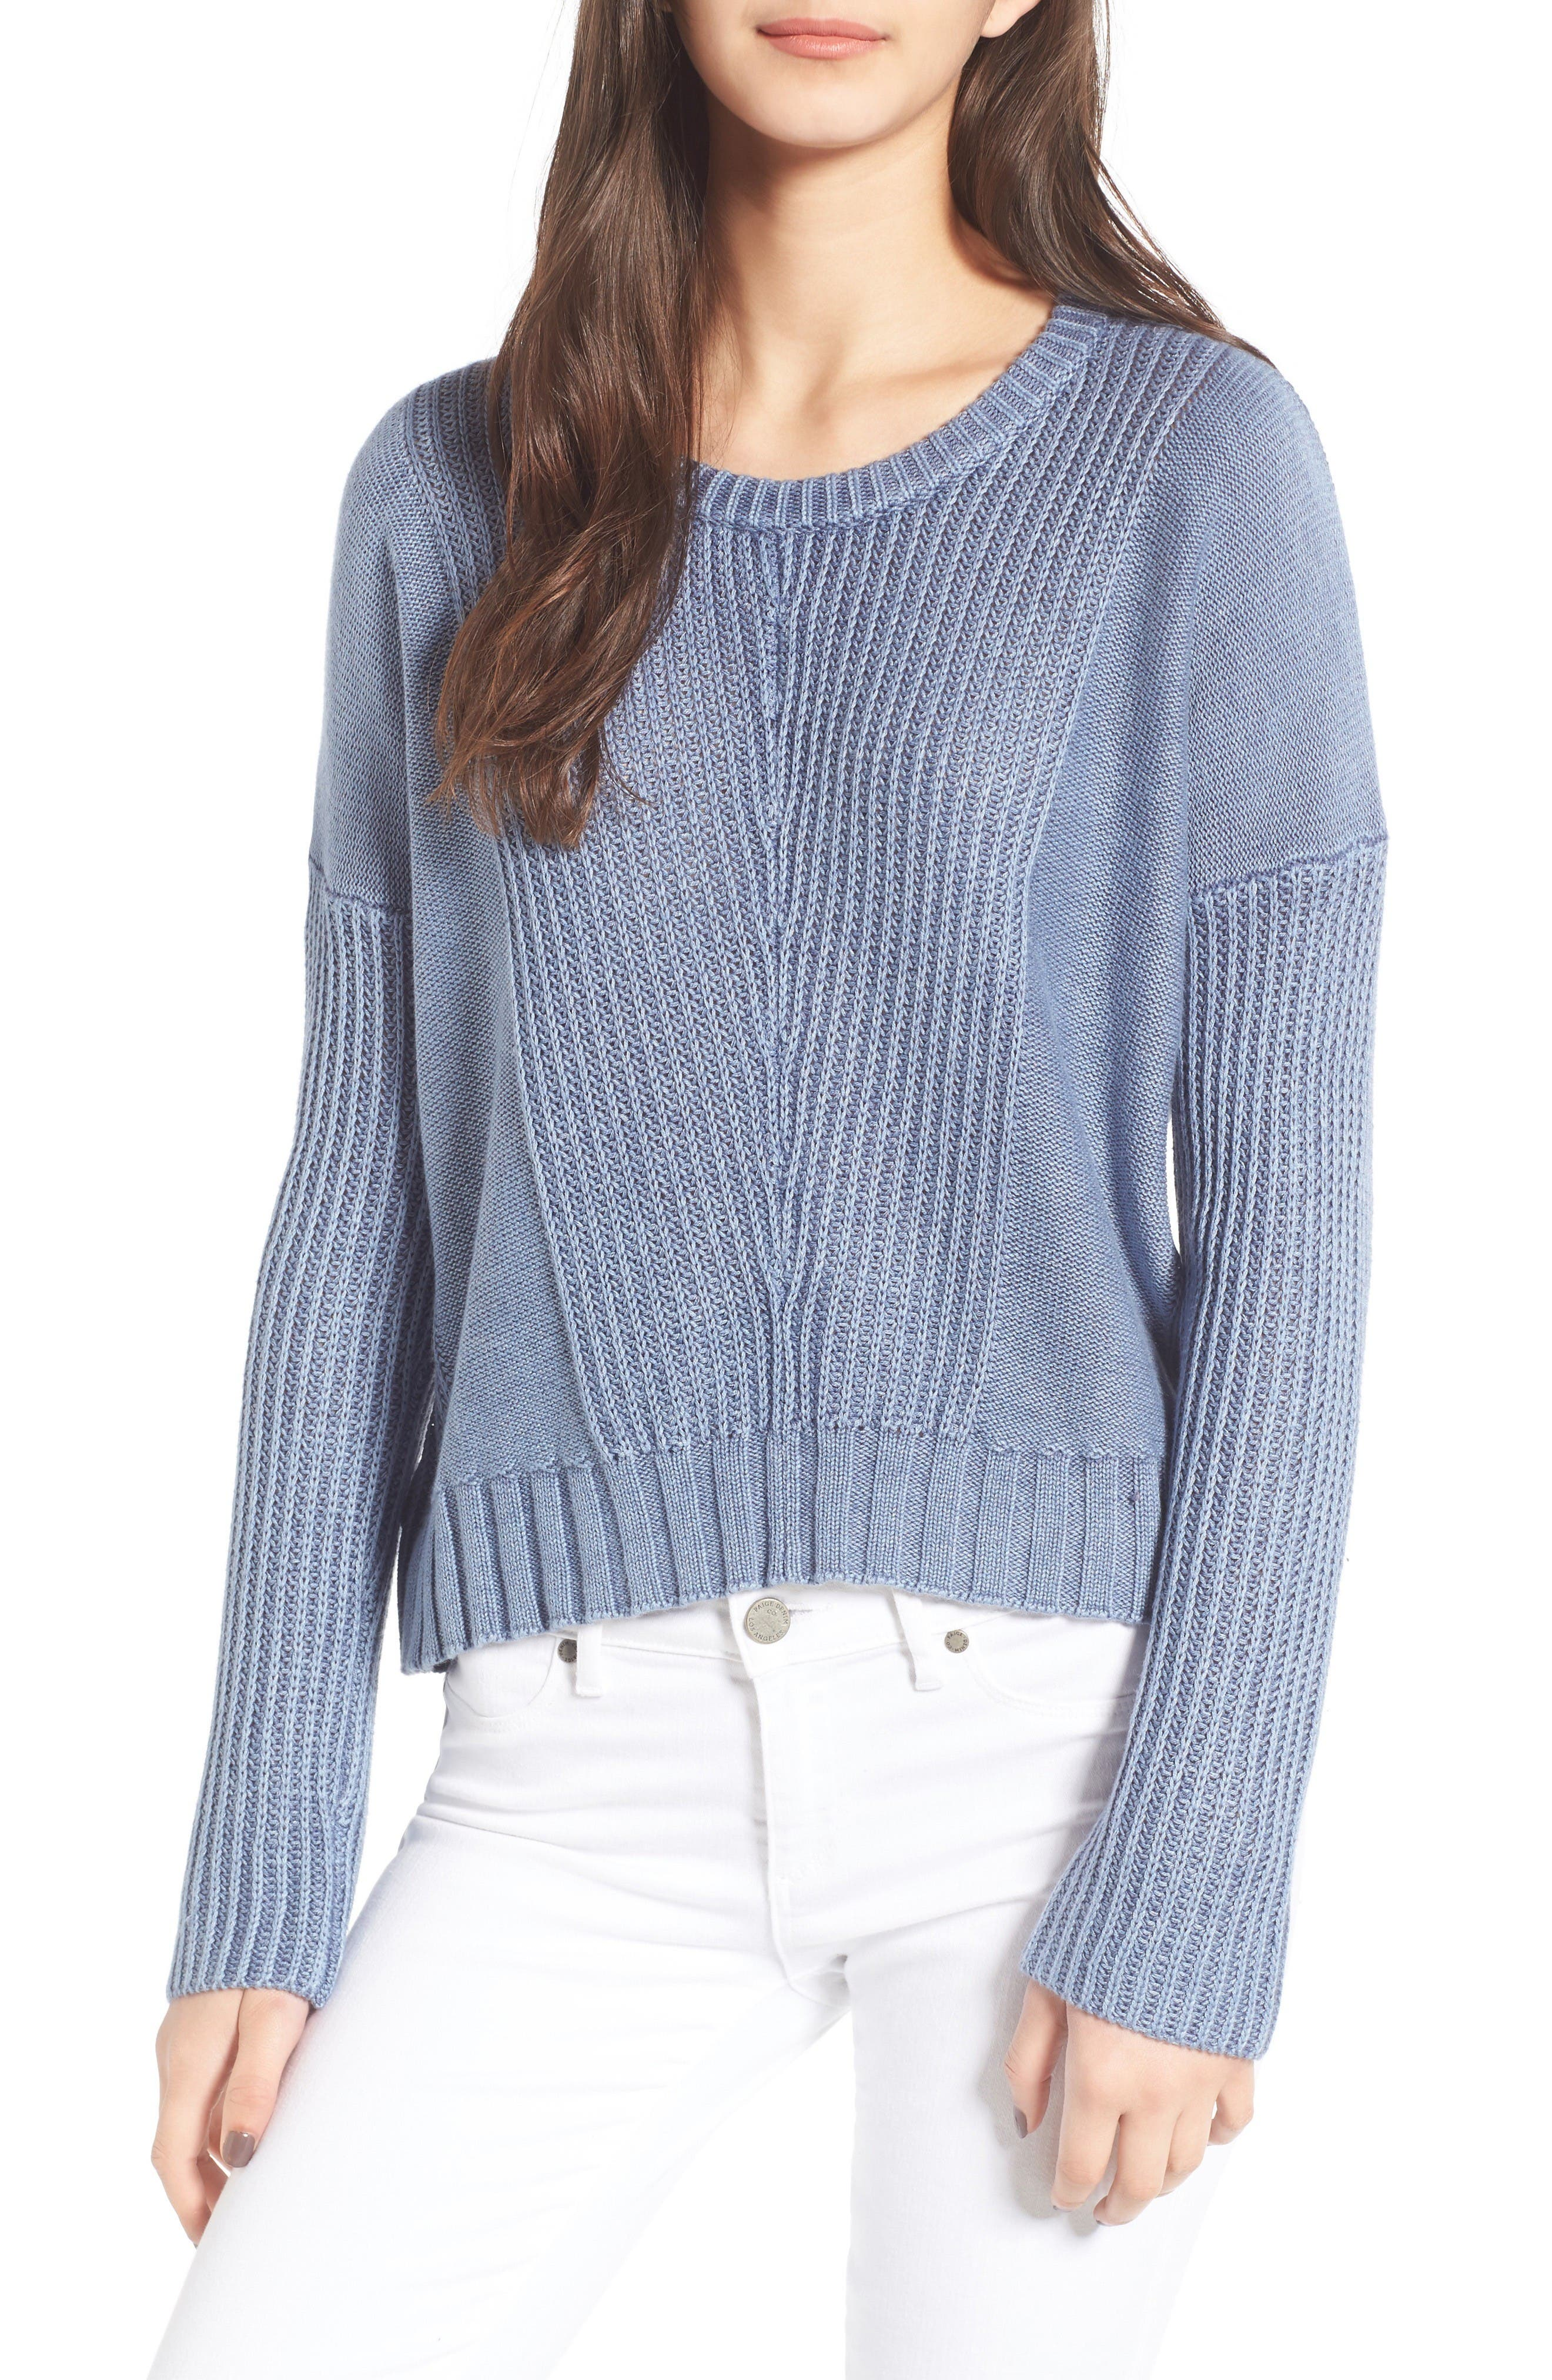 Alternate Image 1 Selected - Rails Elsa Sweater